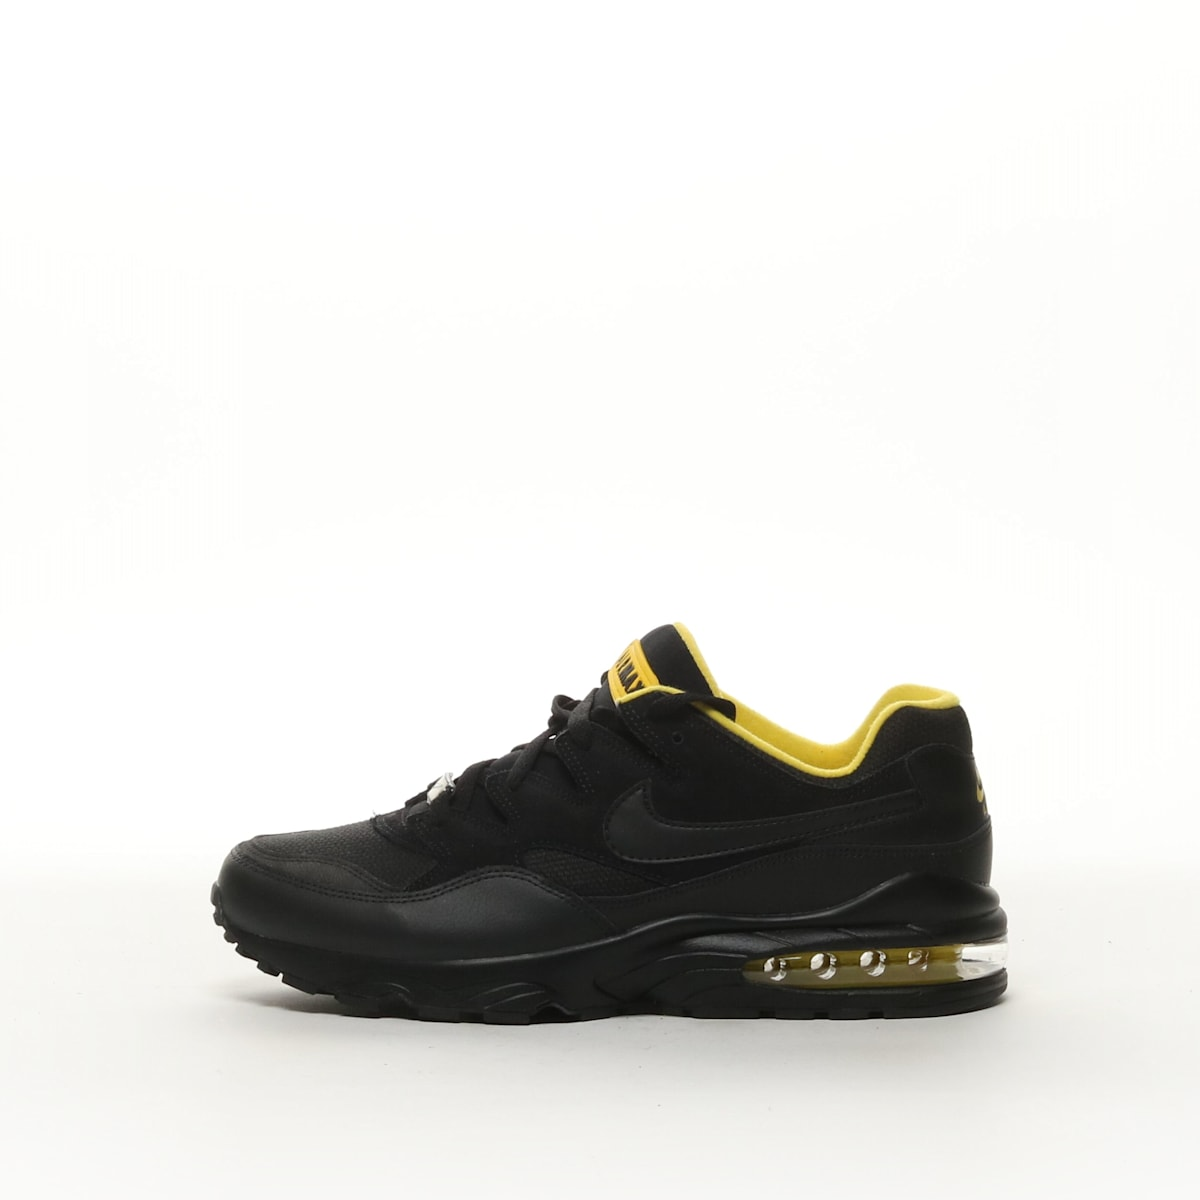 6ef4d44dd0 Nike Air Max 94 SE - BLACK/TOUR YELLOW/BLACK – Resku